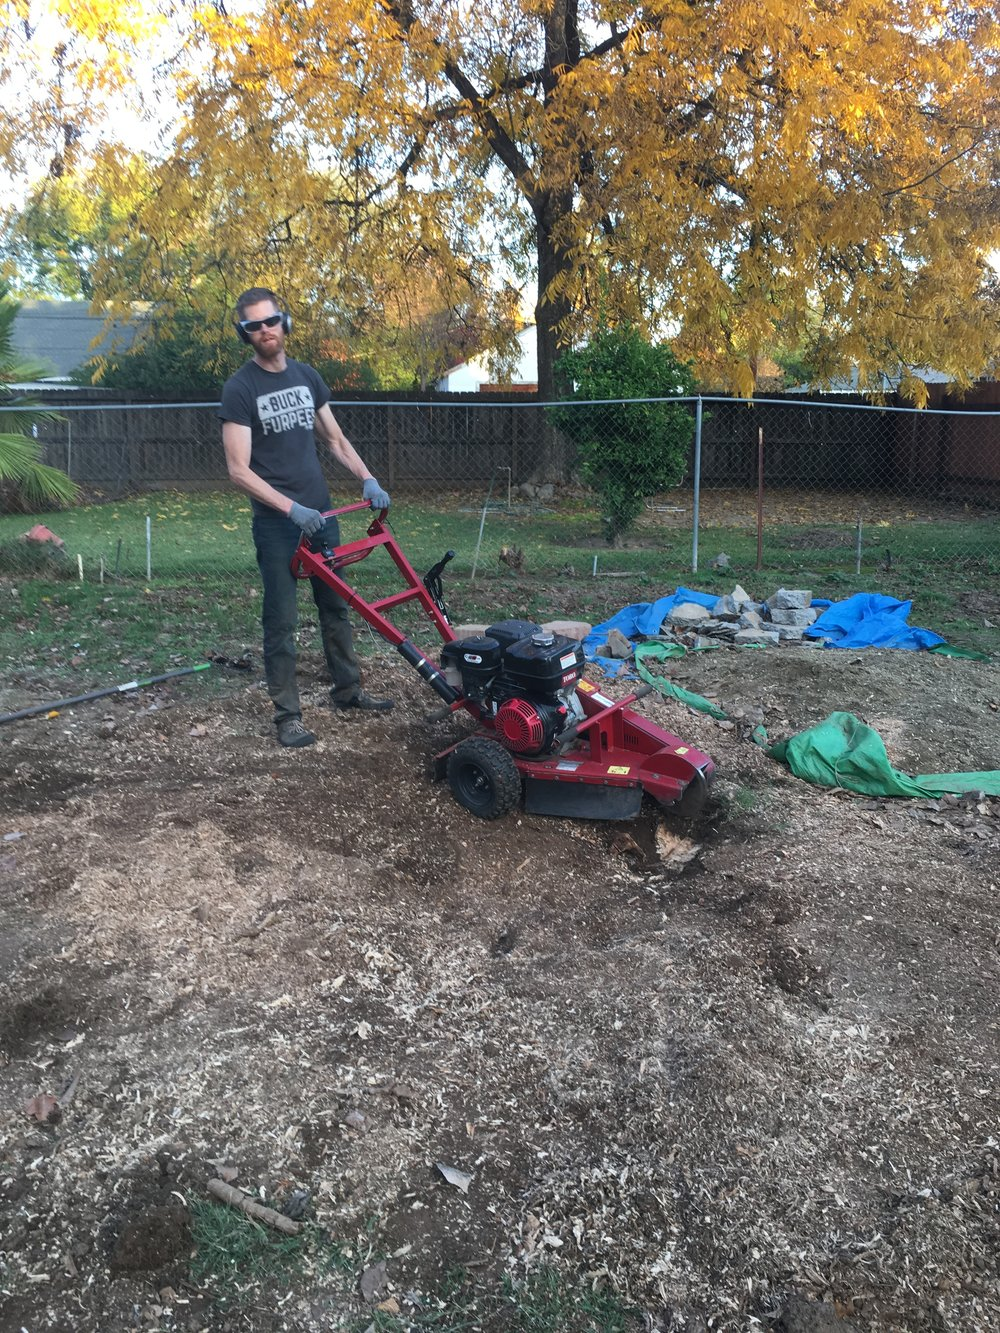 - Here's Tim, finishing off that stump!